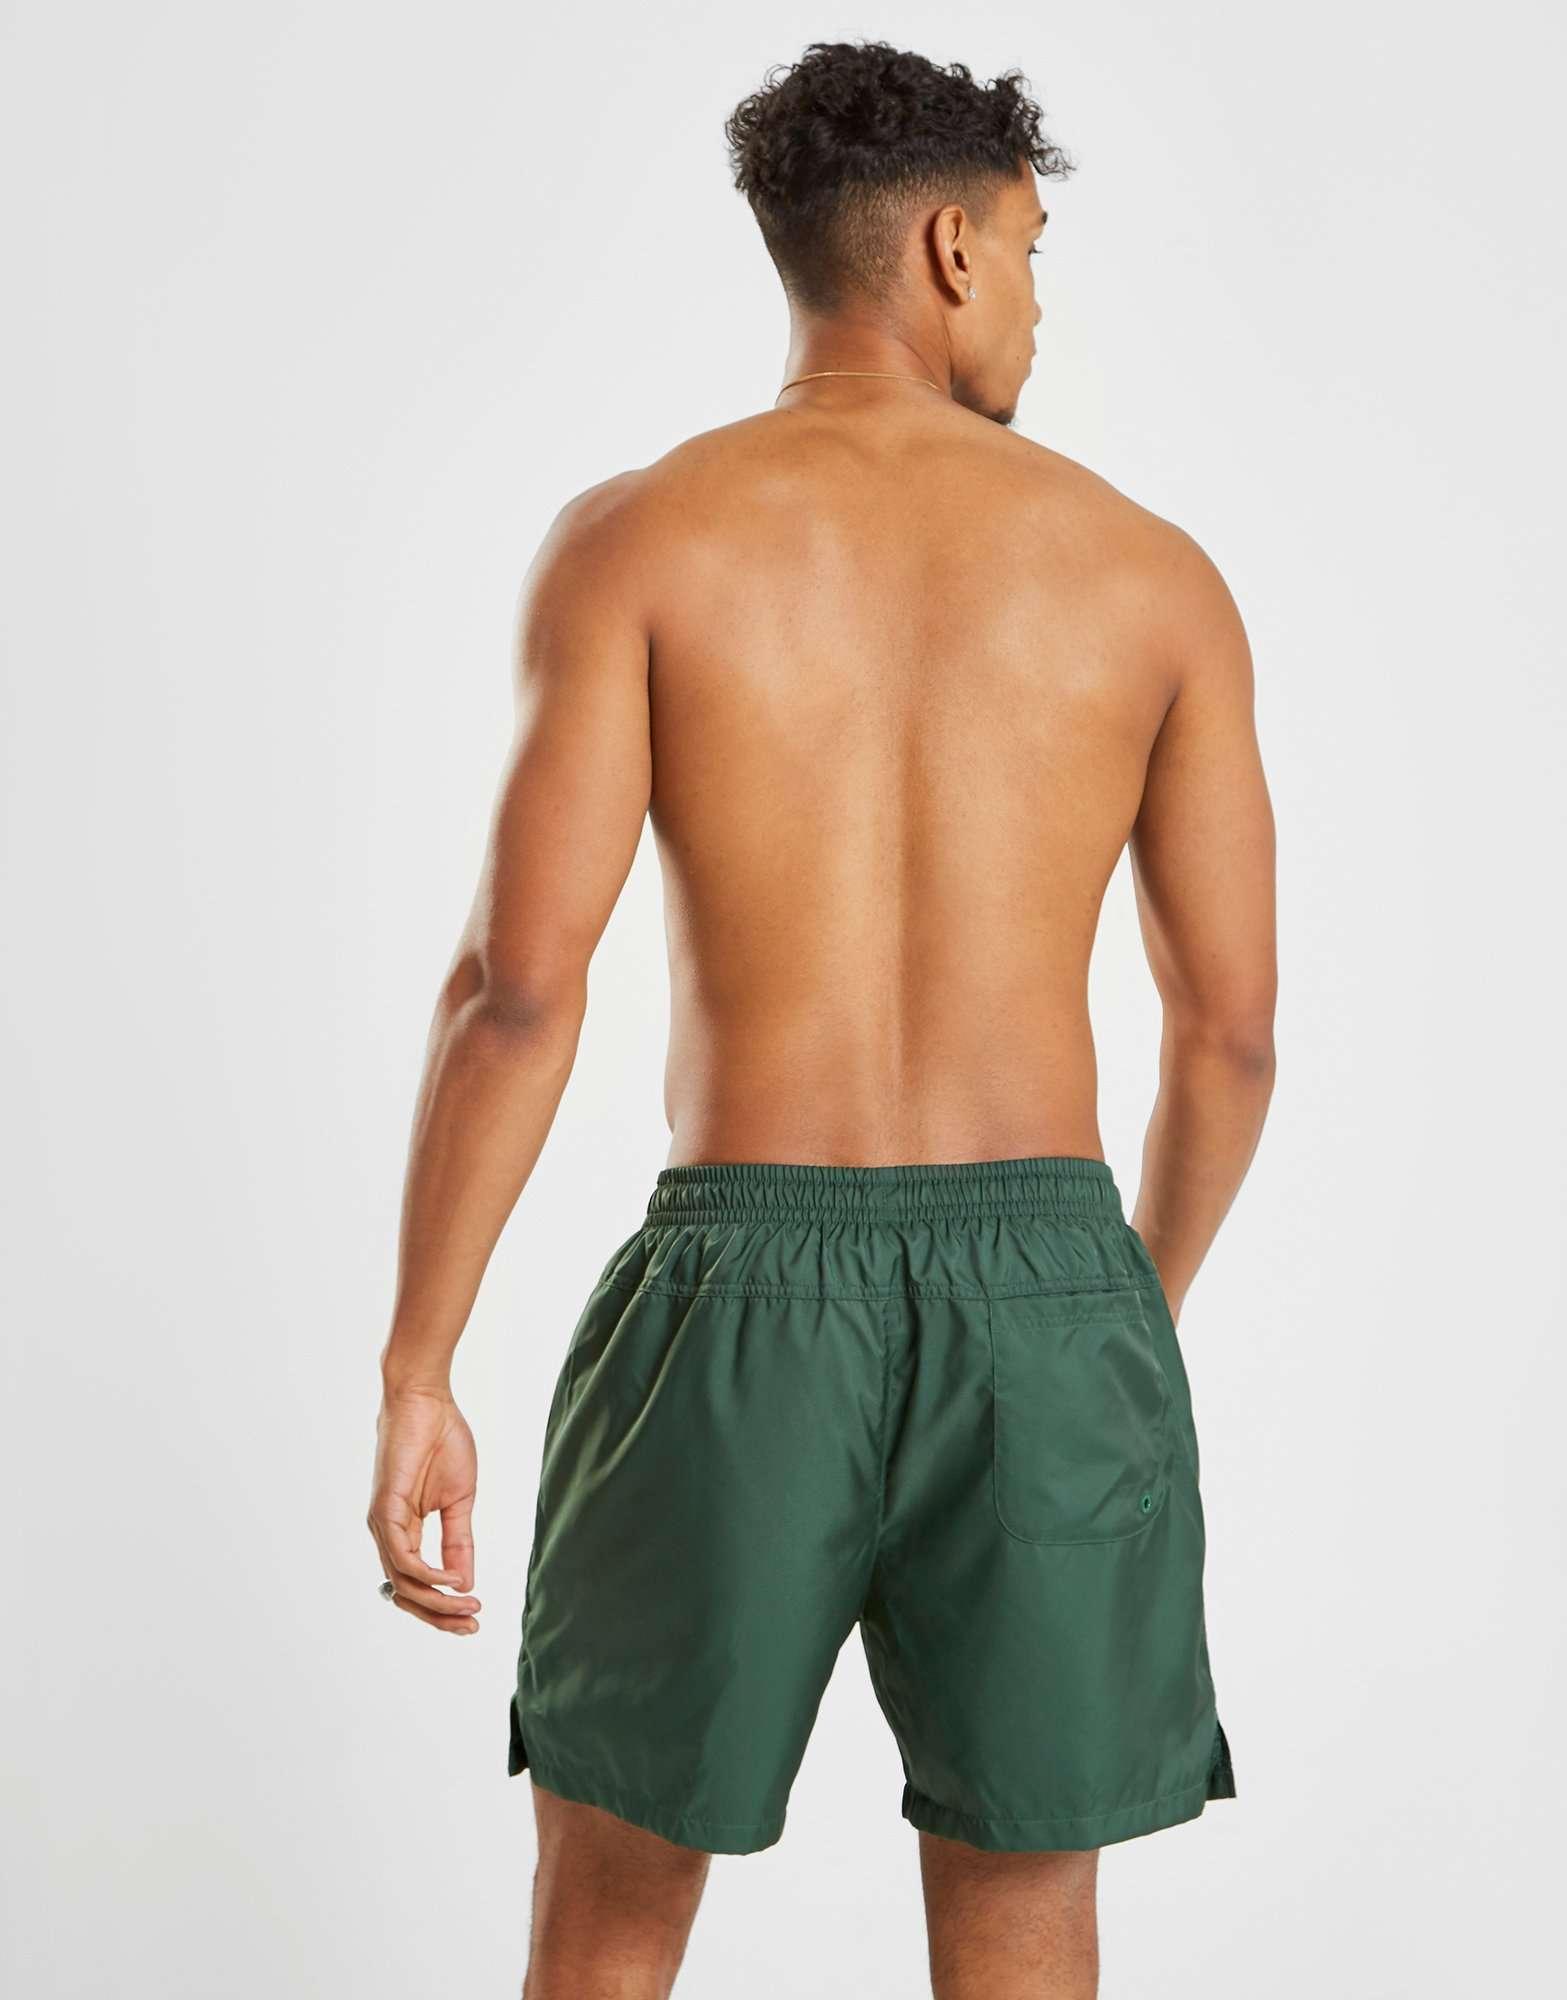 Nike Flow Woven Swim Shorts